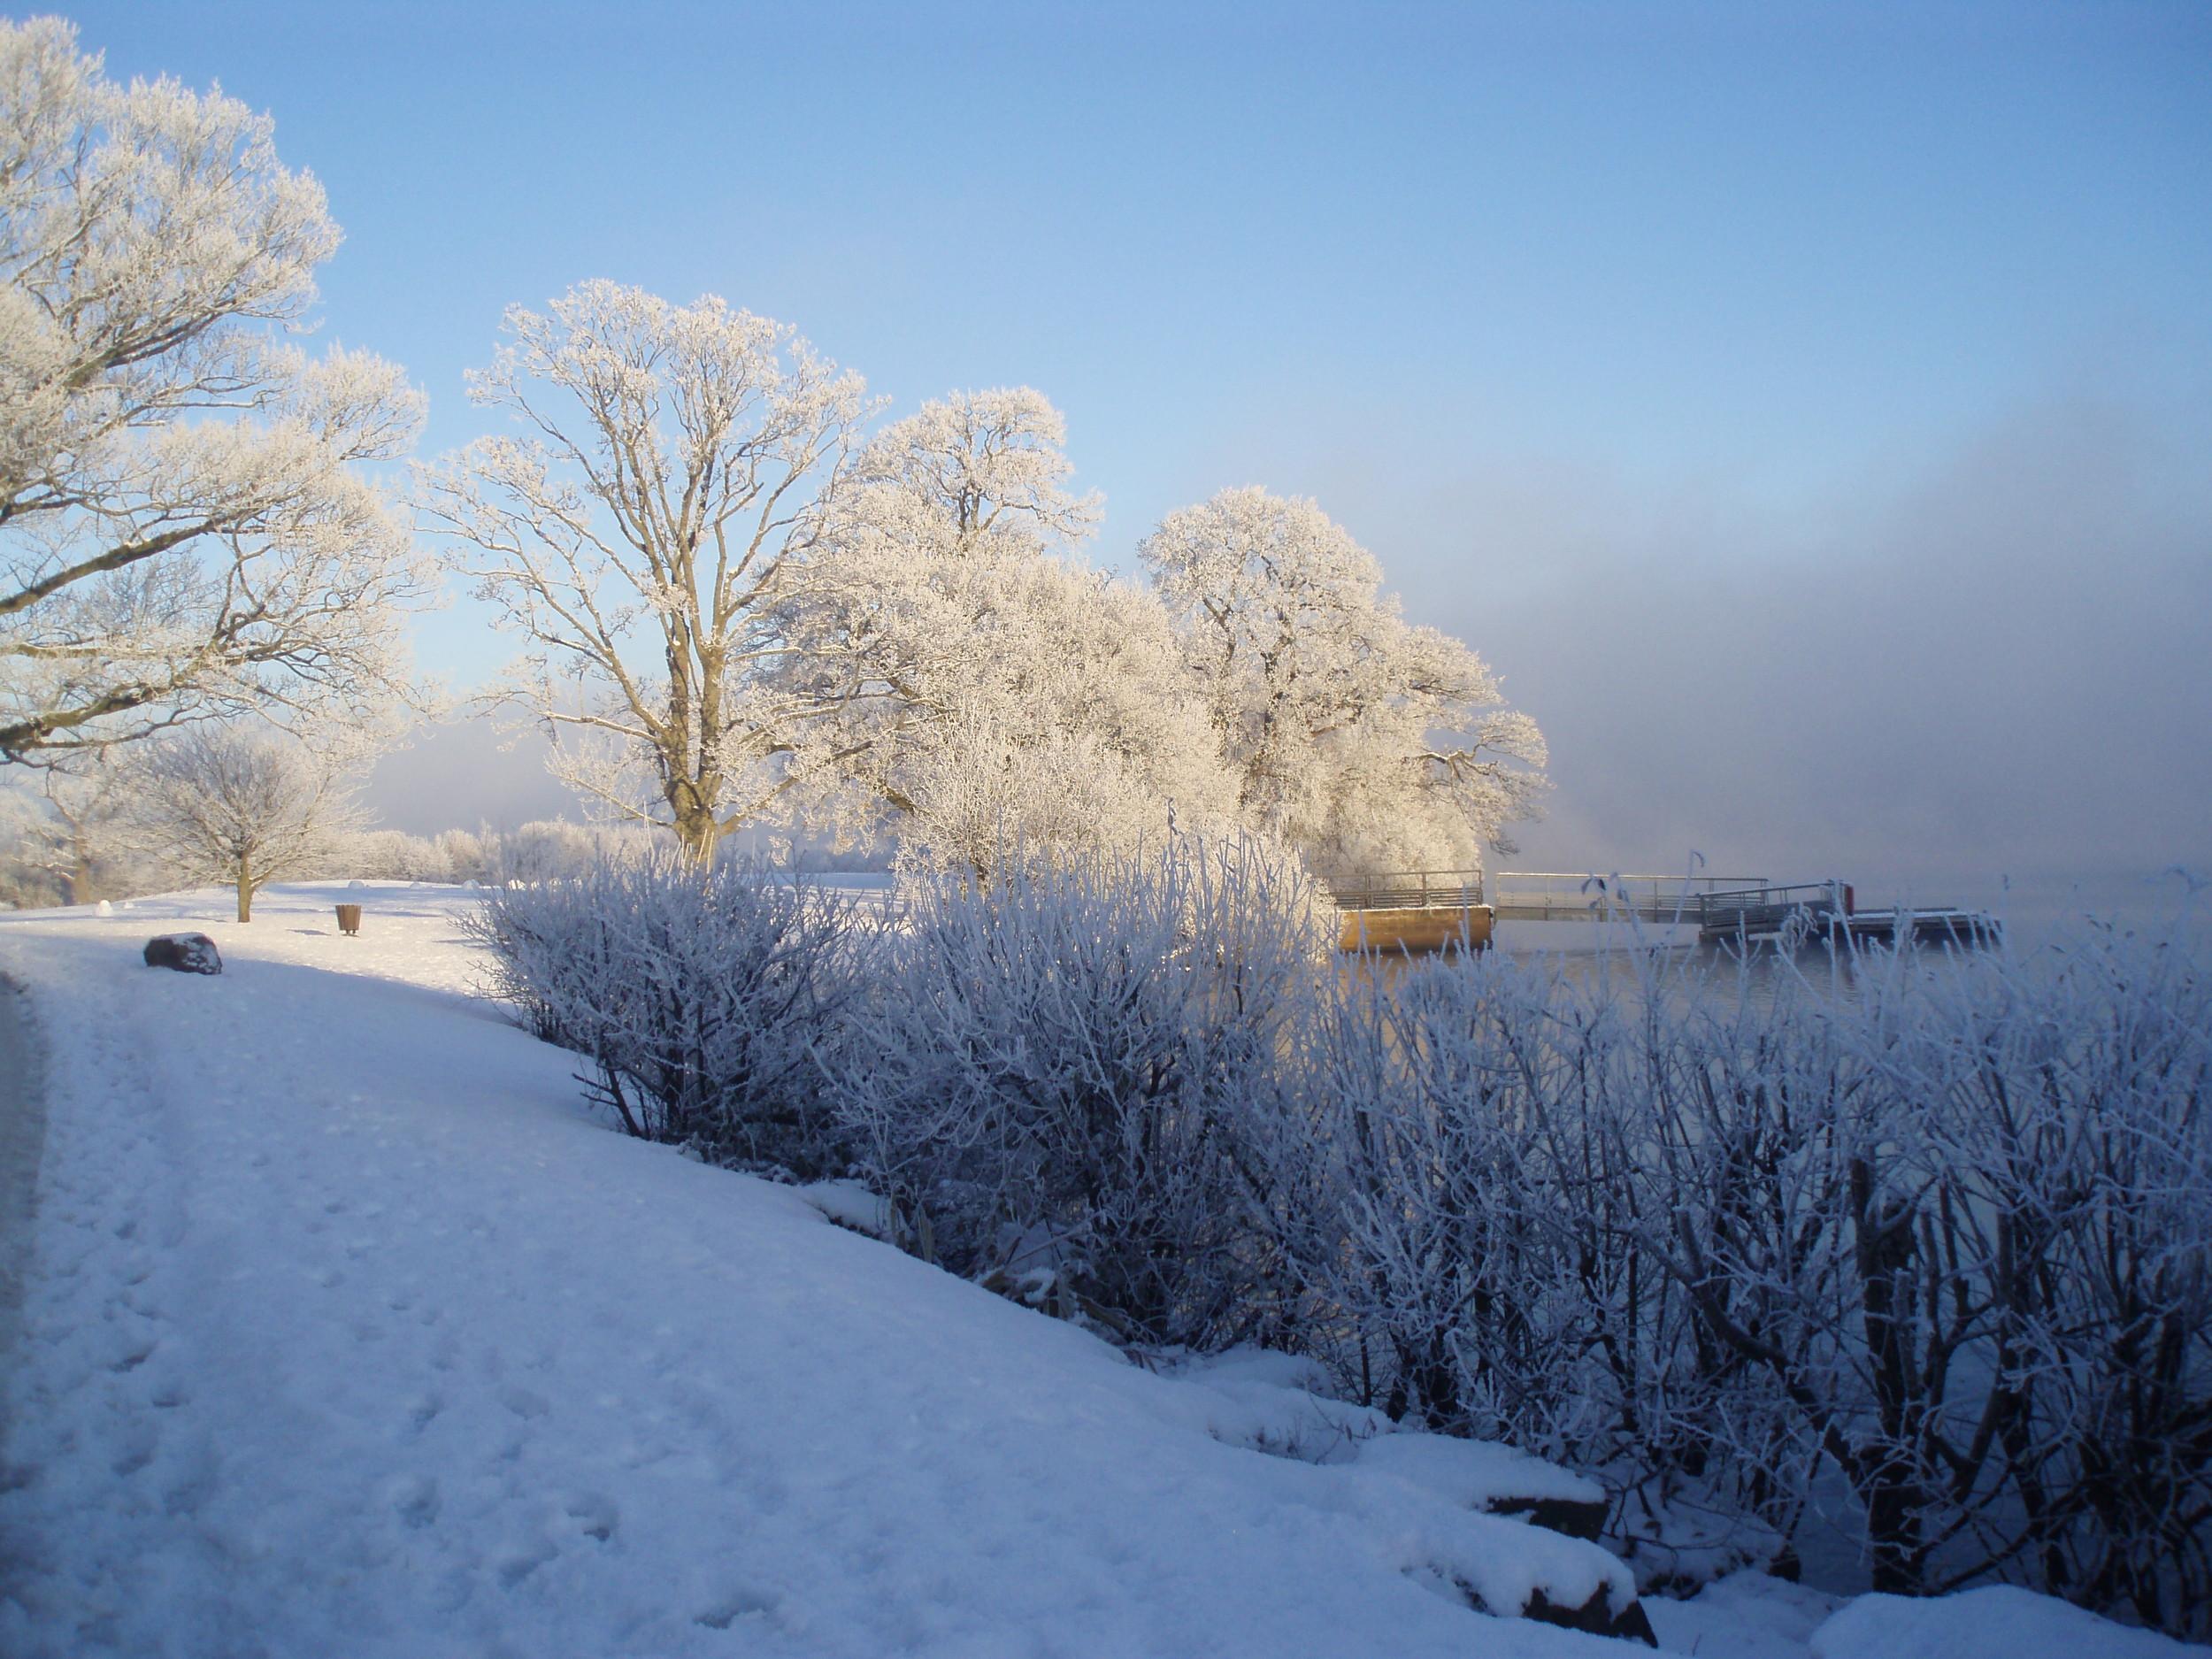 Loch Lomond The Perfect Winter Wonderland Hello Scotland